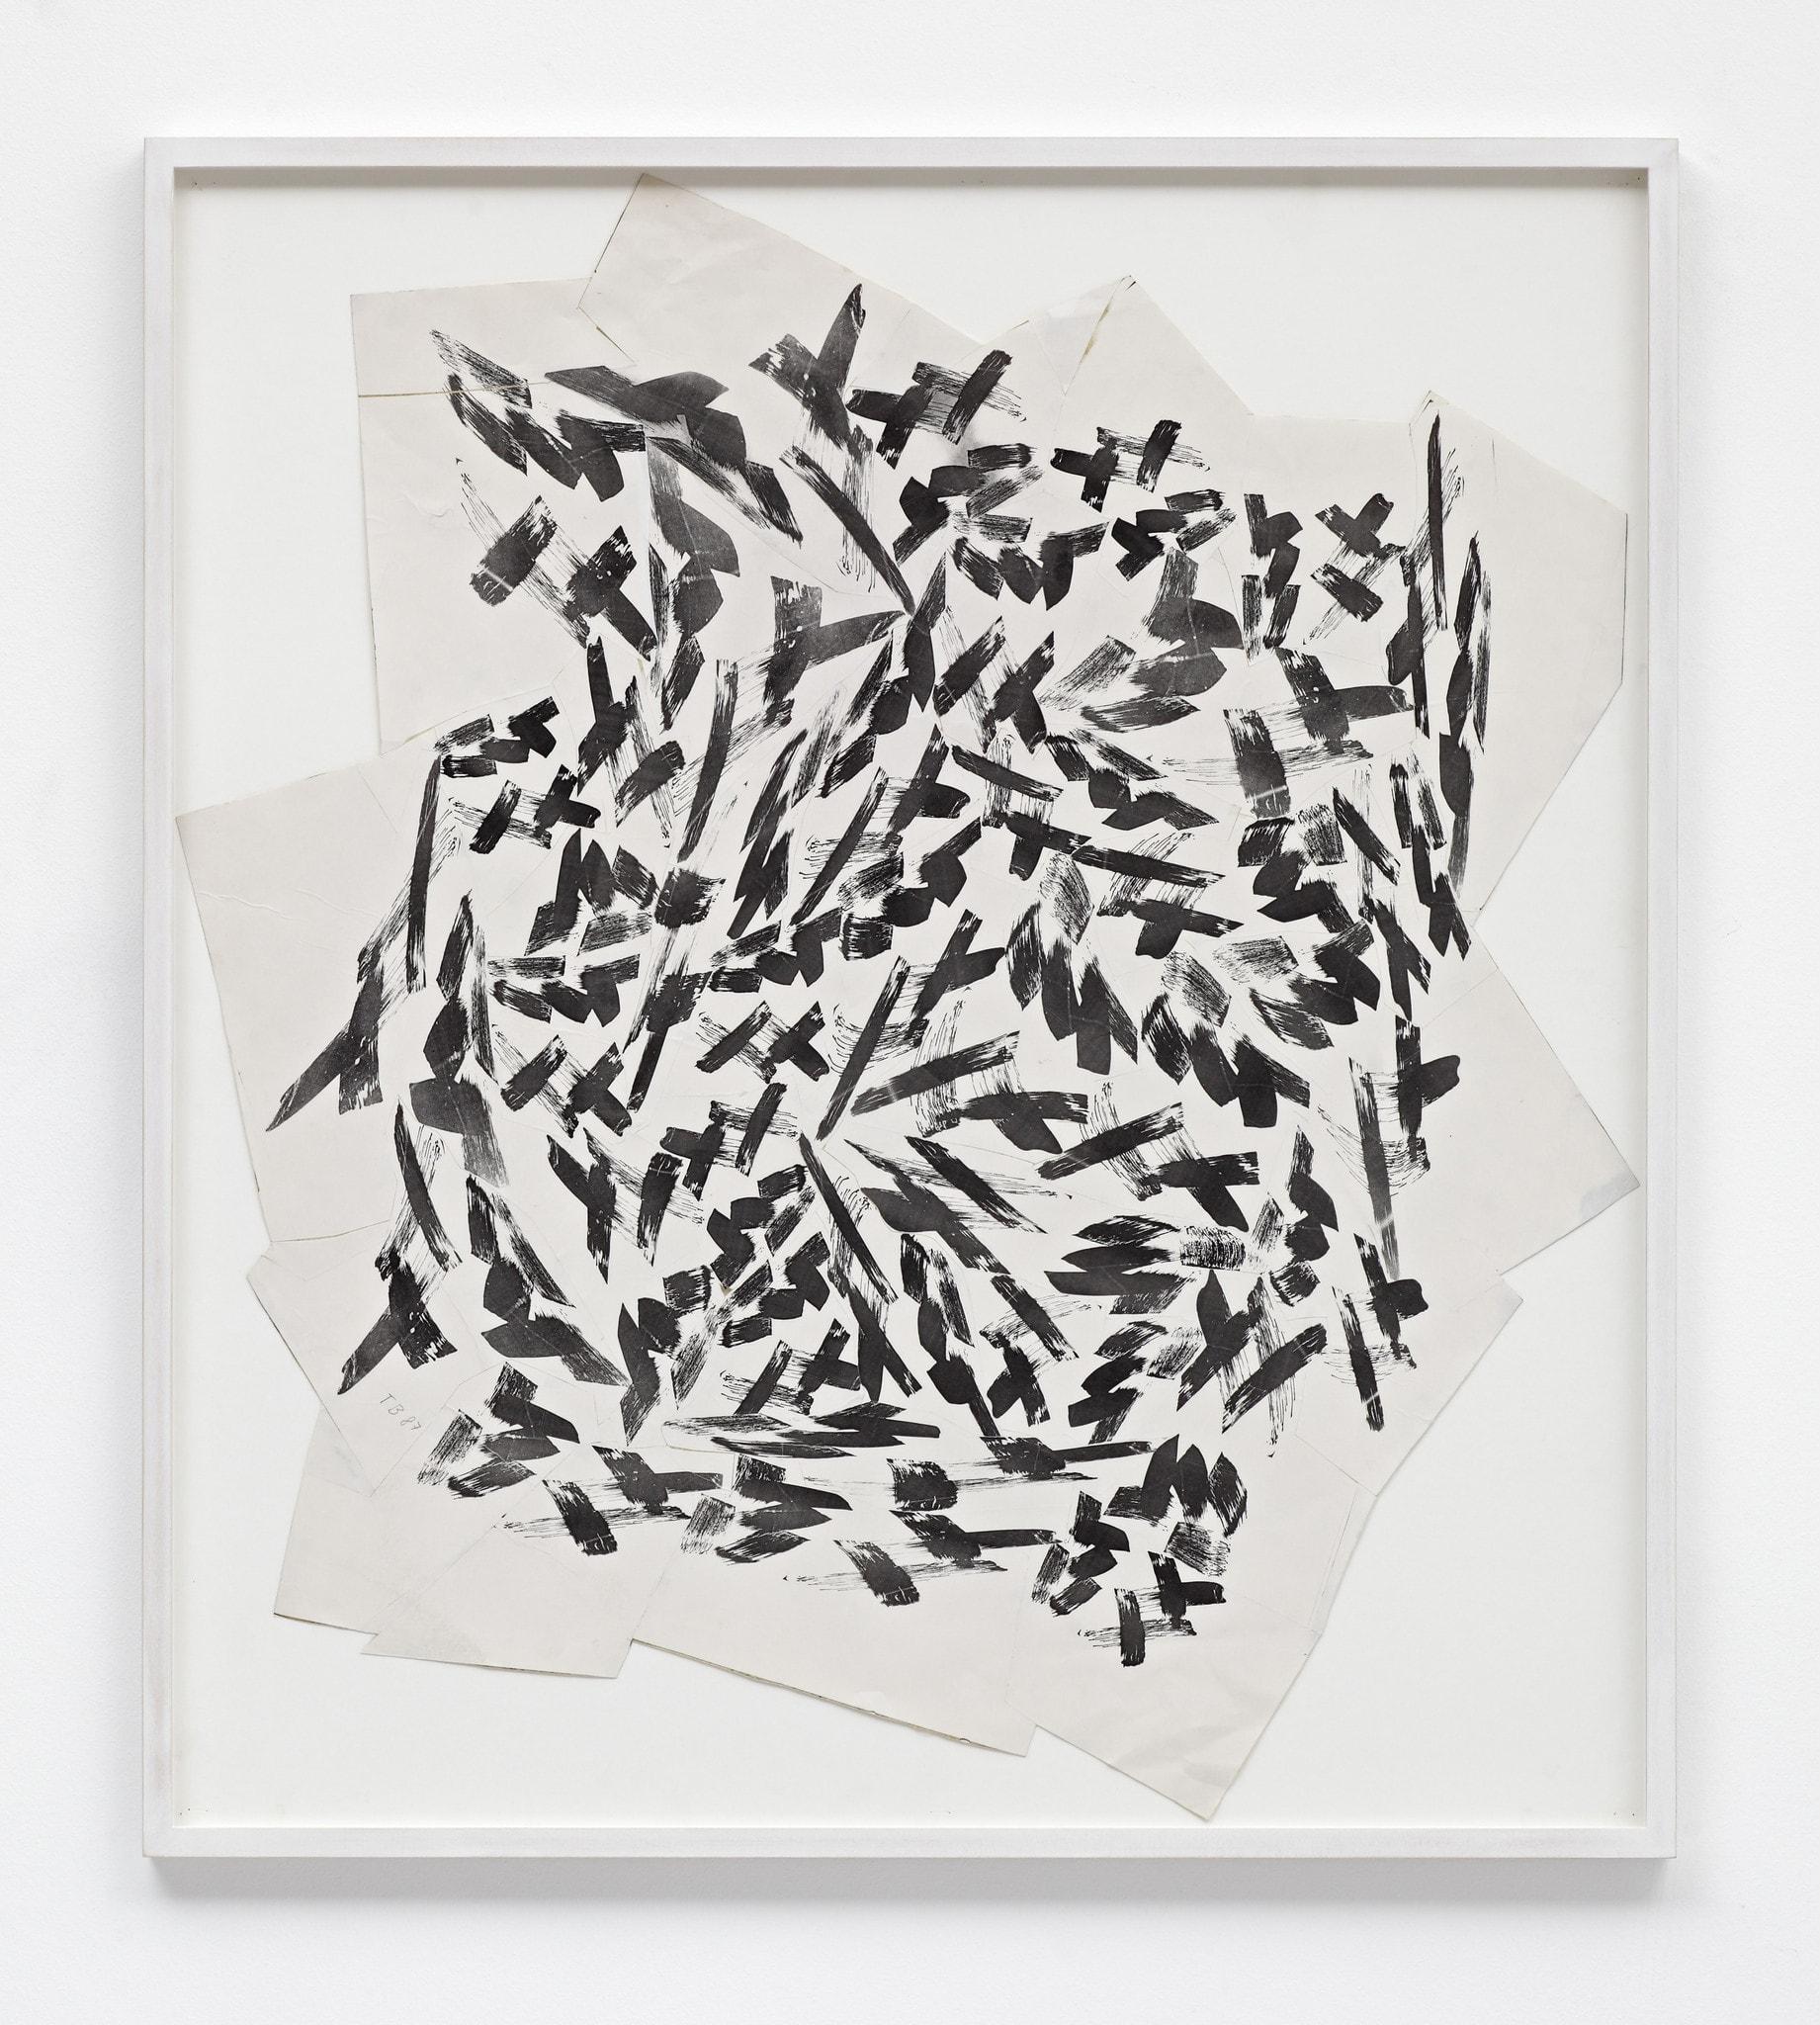 Pinselkomposition by Thomas Bayrle